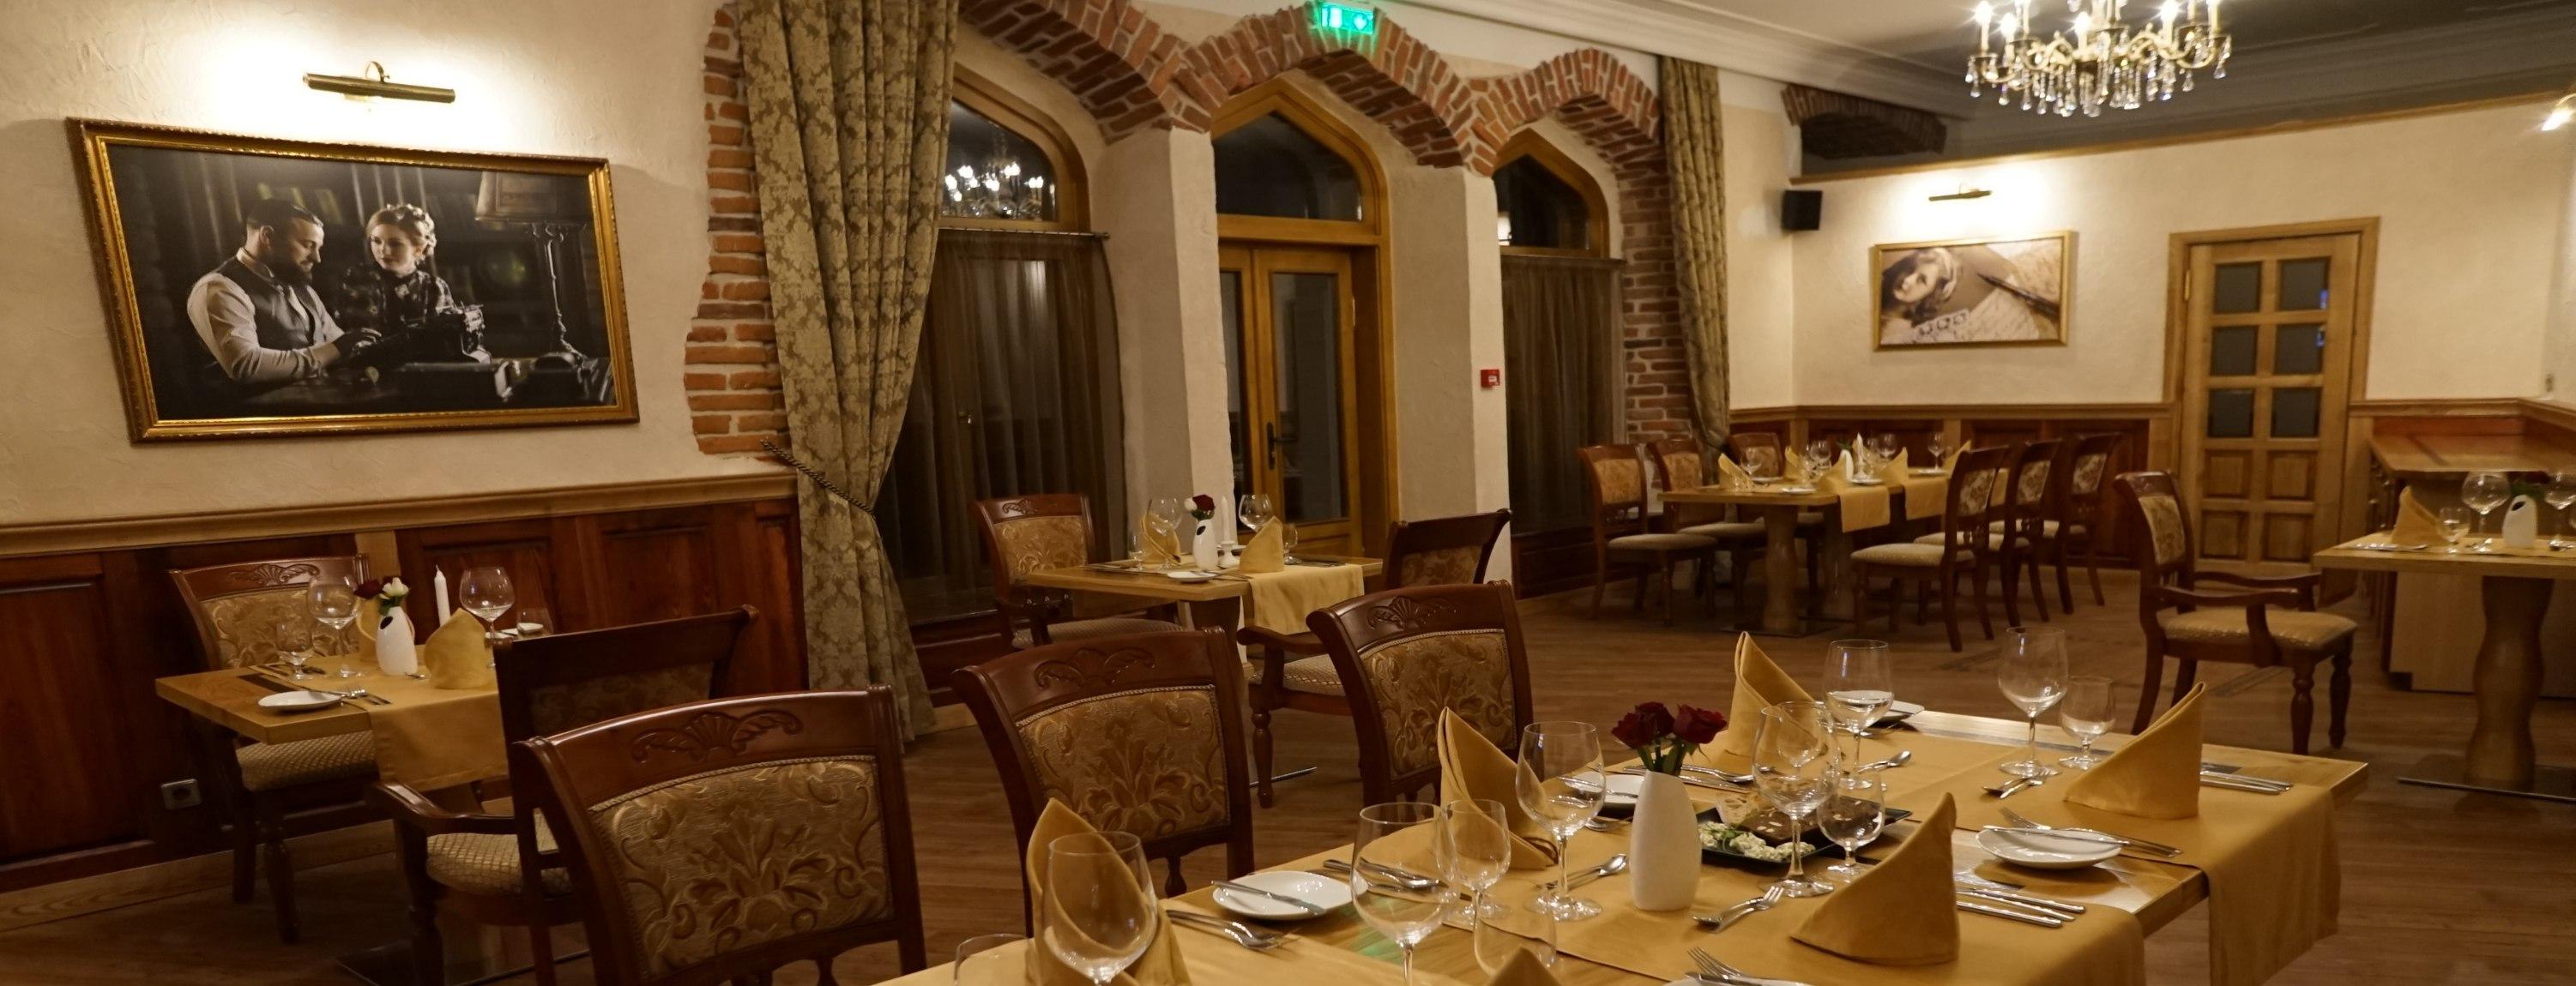 video_restoran